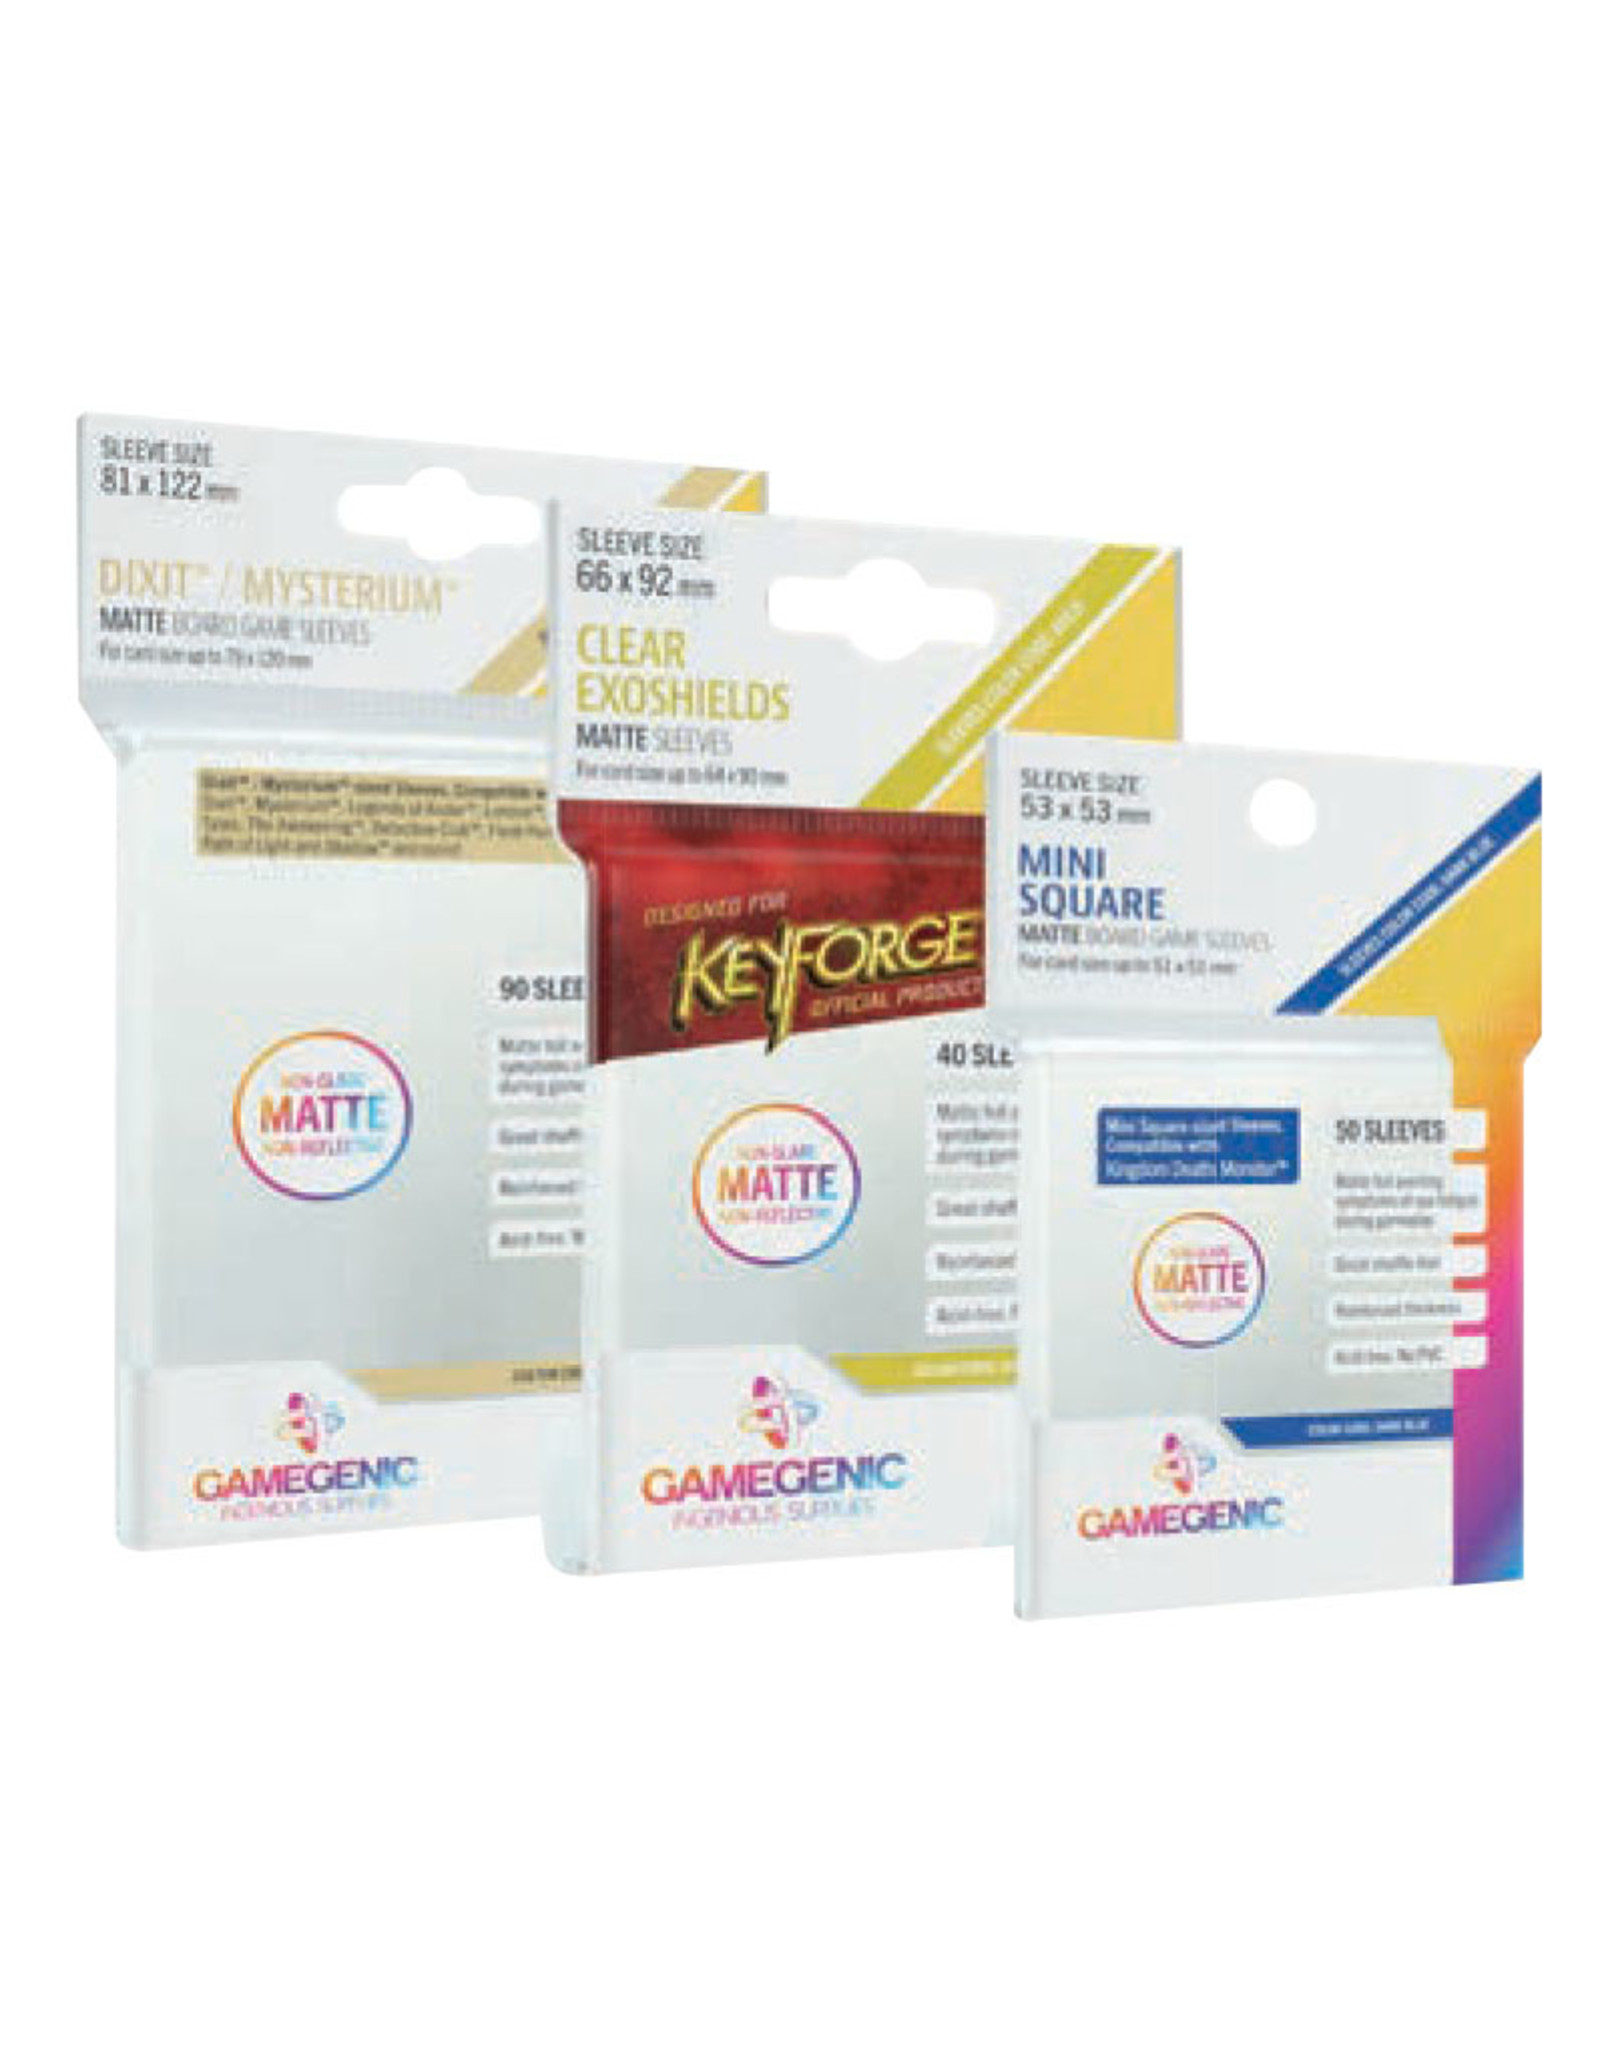 Asmodee Matte Board Game Sleeves: KeyForge Exoshields Clear 66mm x 92mm (40) (Gold)